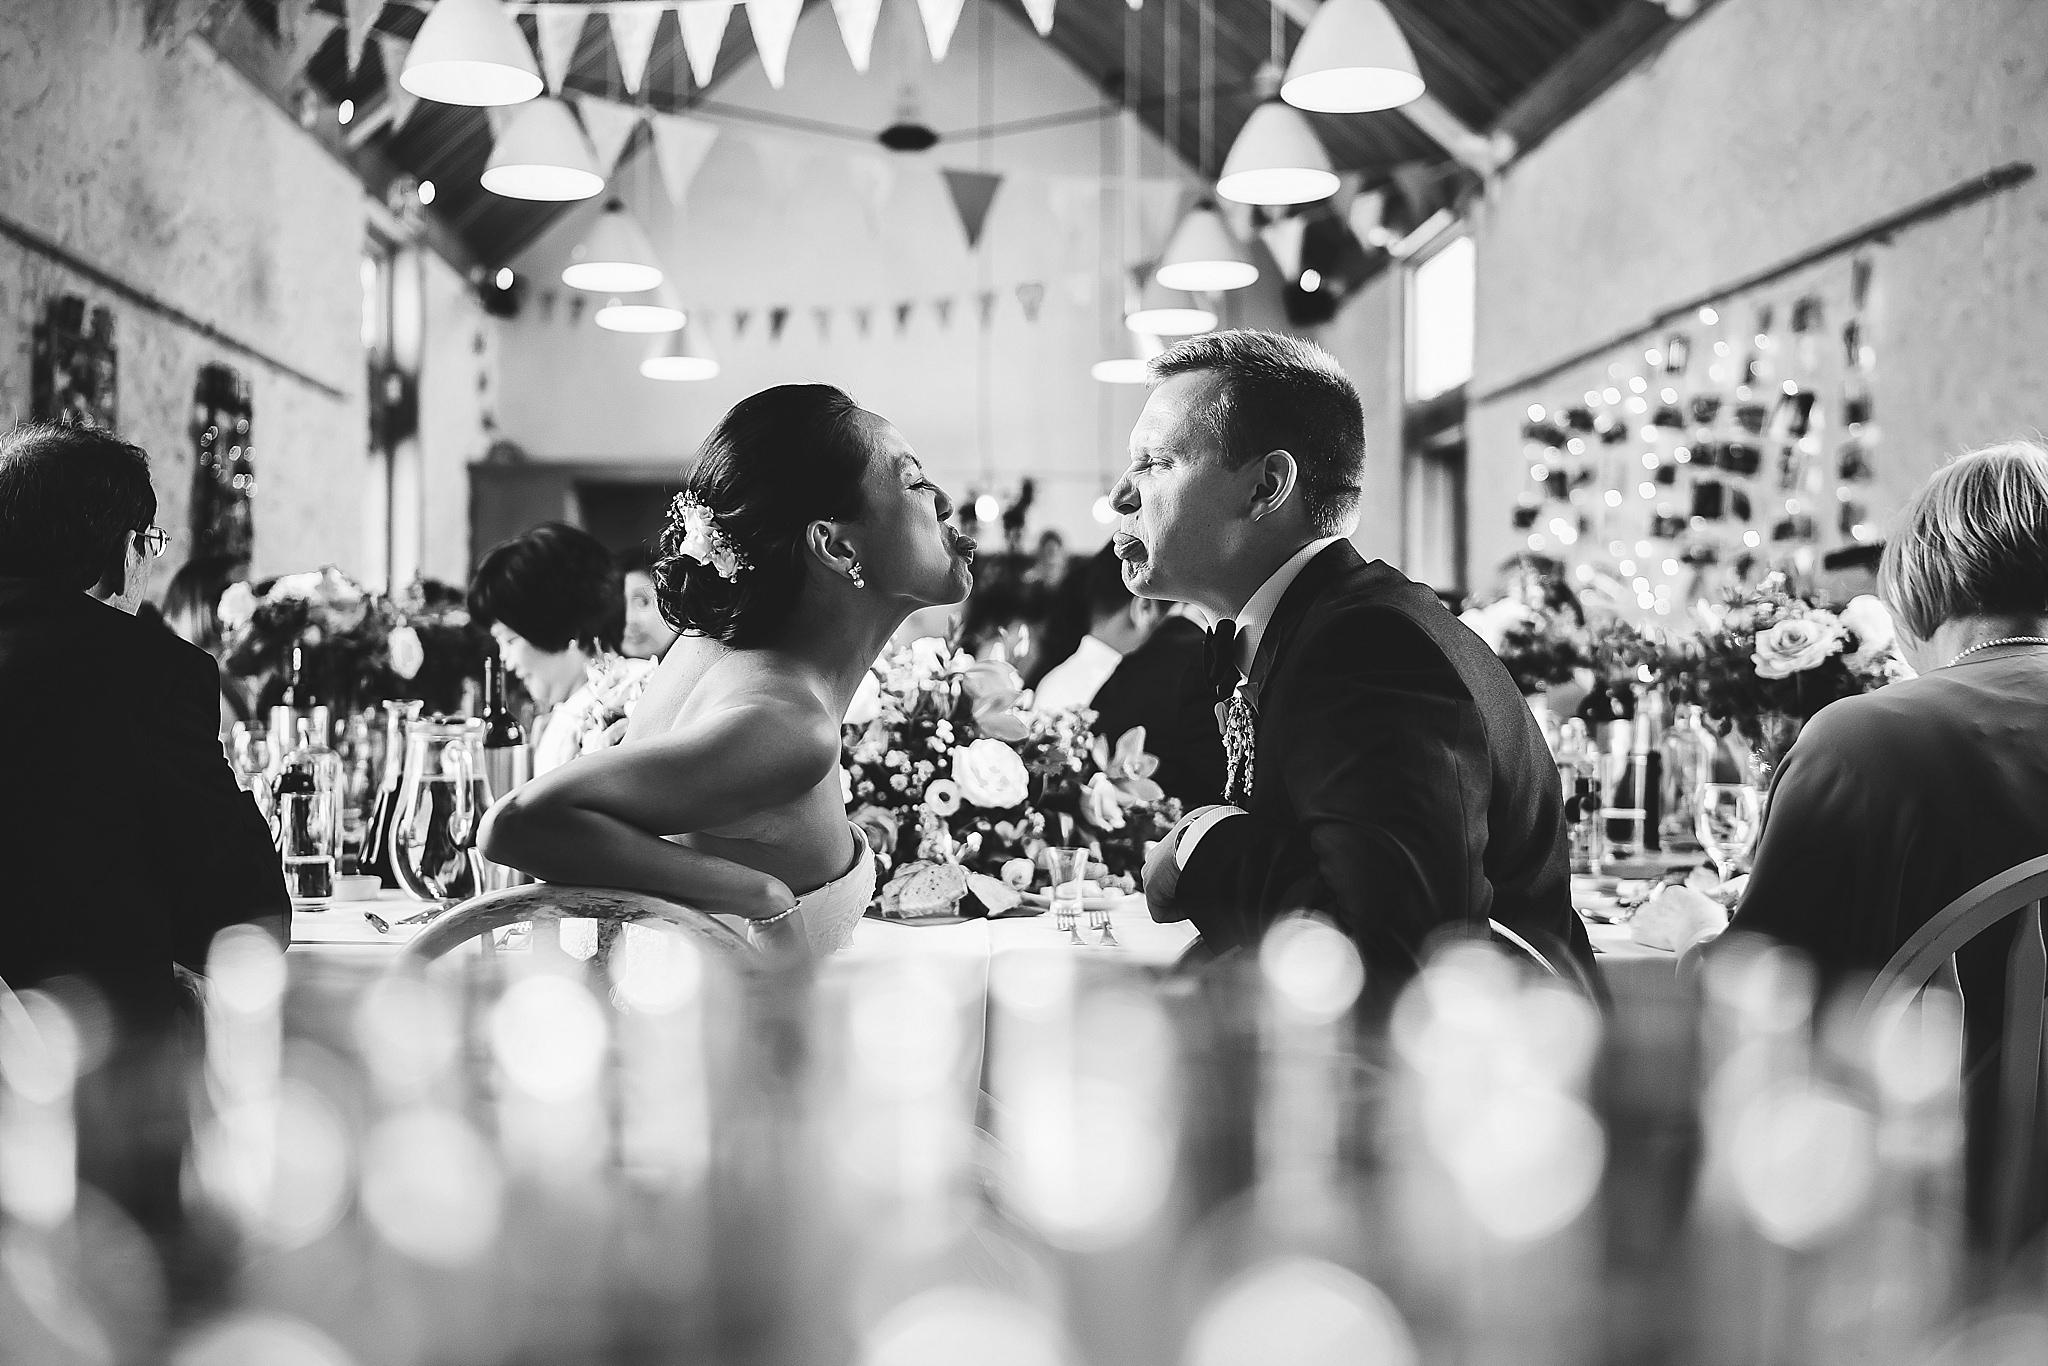 aga-tomaszek-wedding-photographer-cardiff-2016_1095